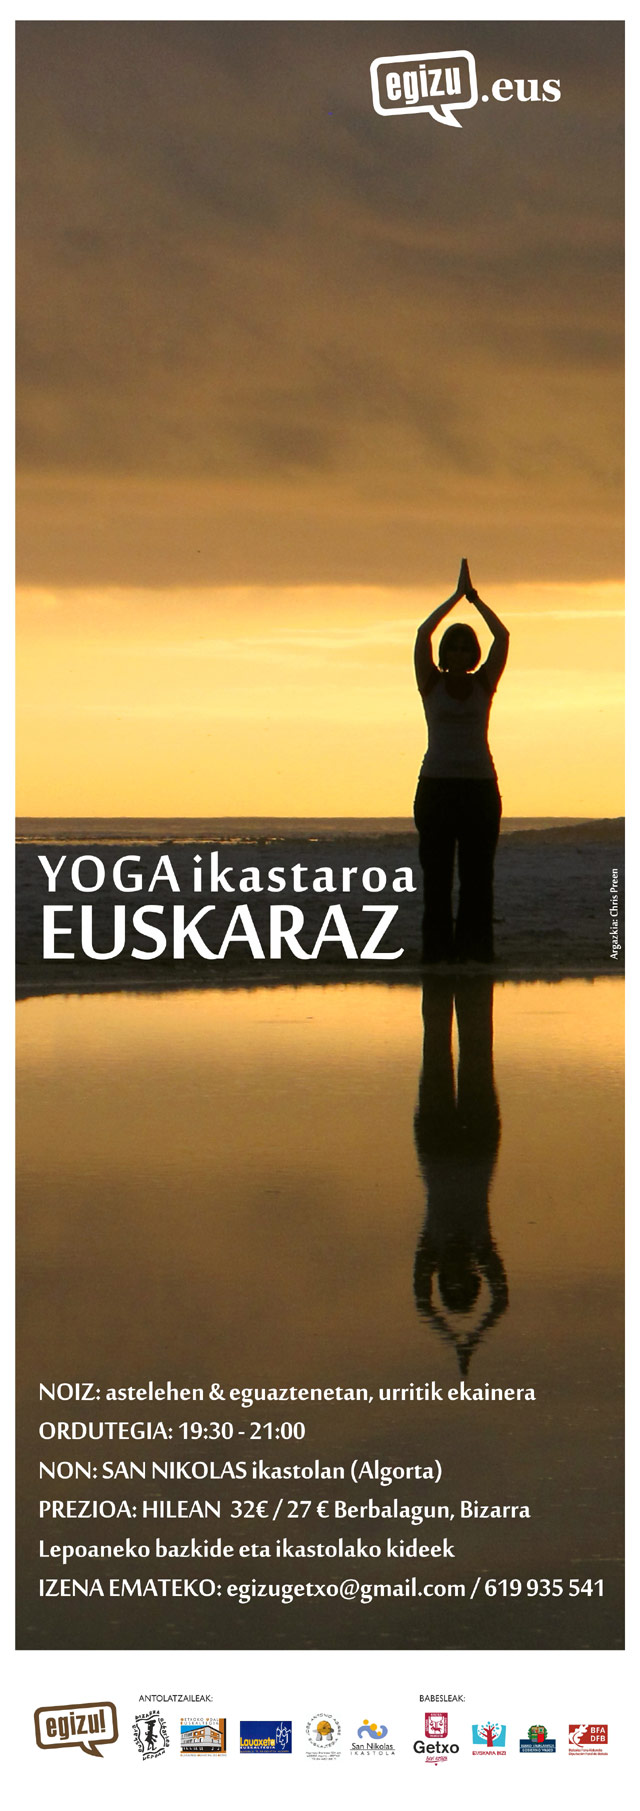 Yoga ikastaroa euskaraz San Nikolas ikastolan